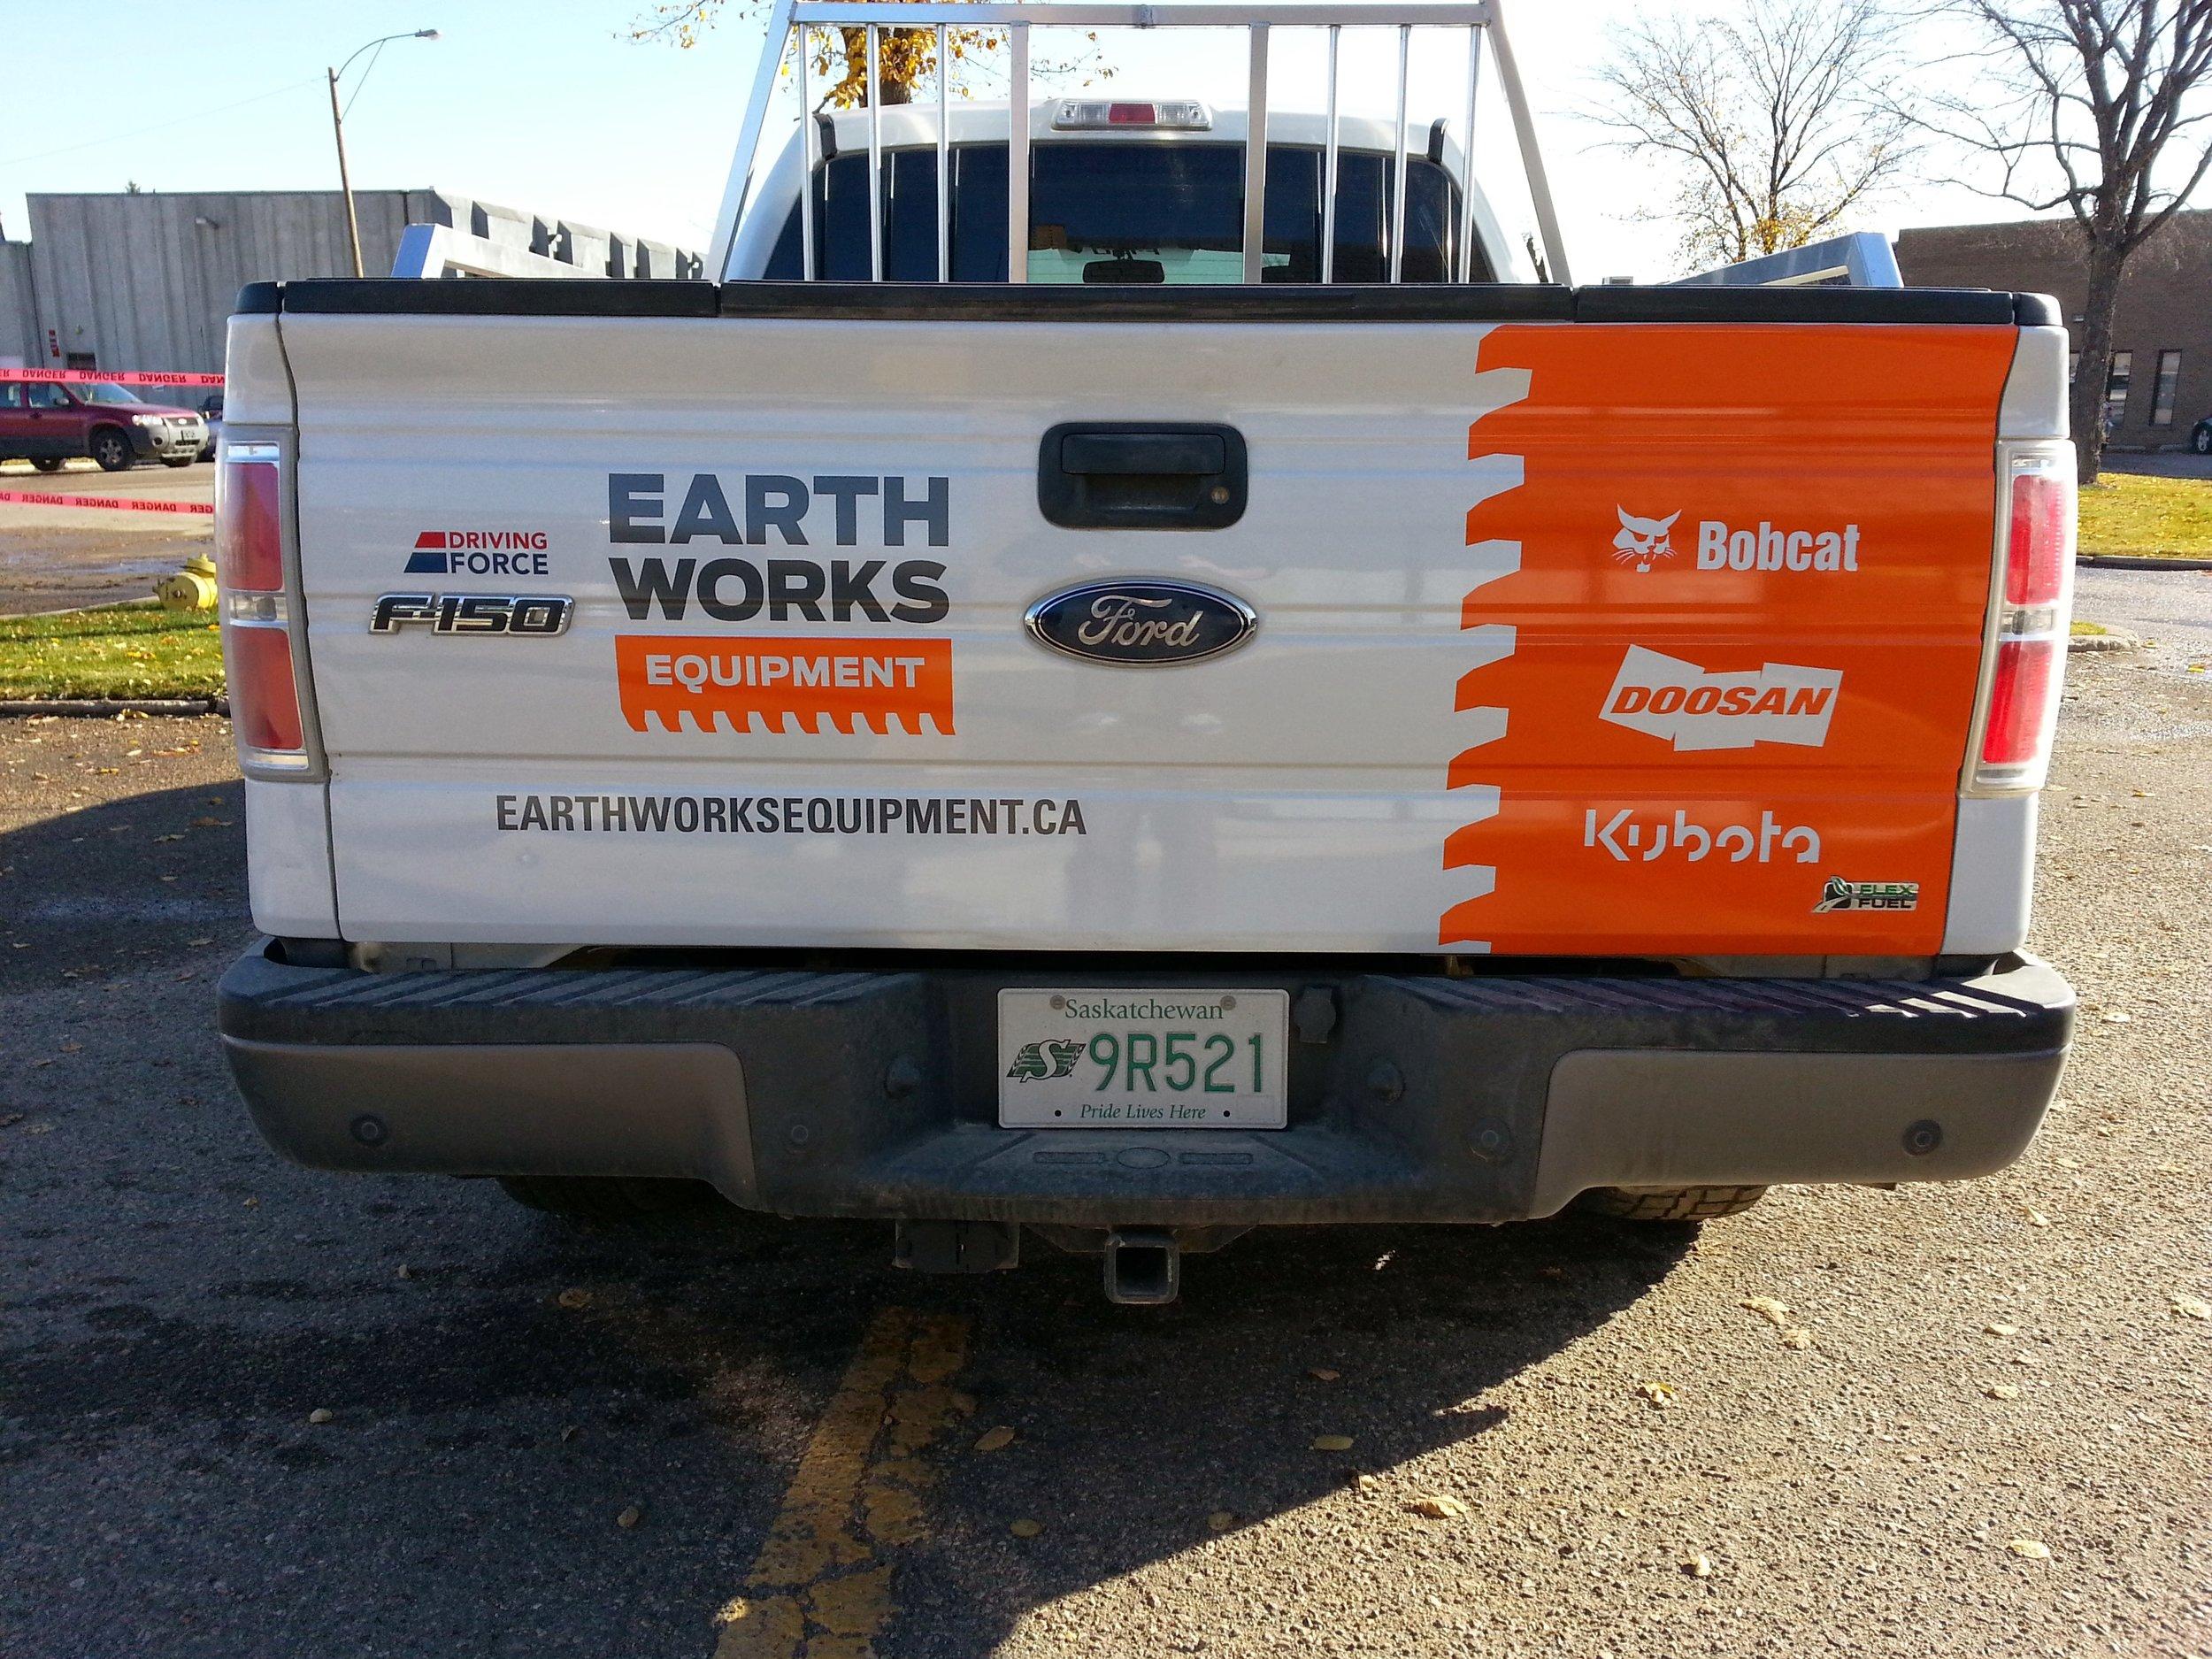 Earth Works Equipment, Saskatoon